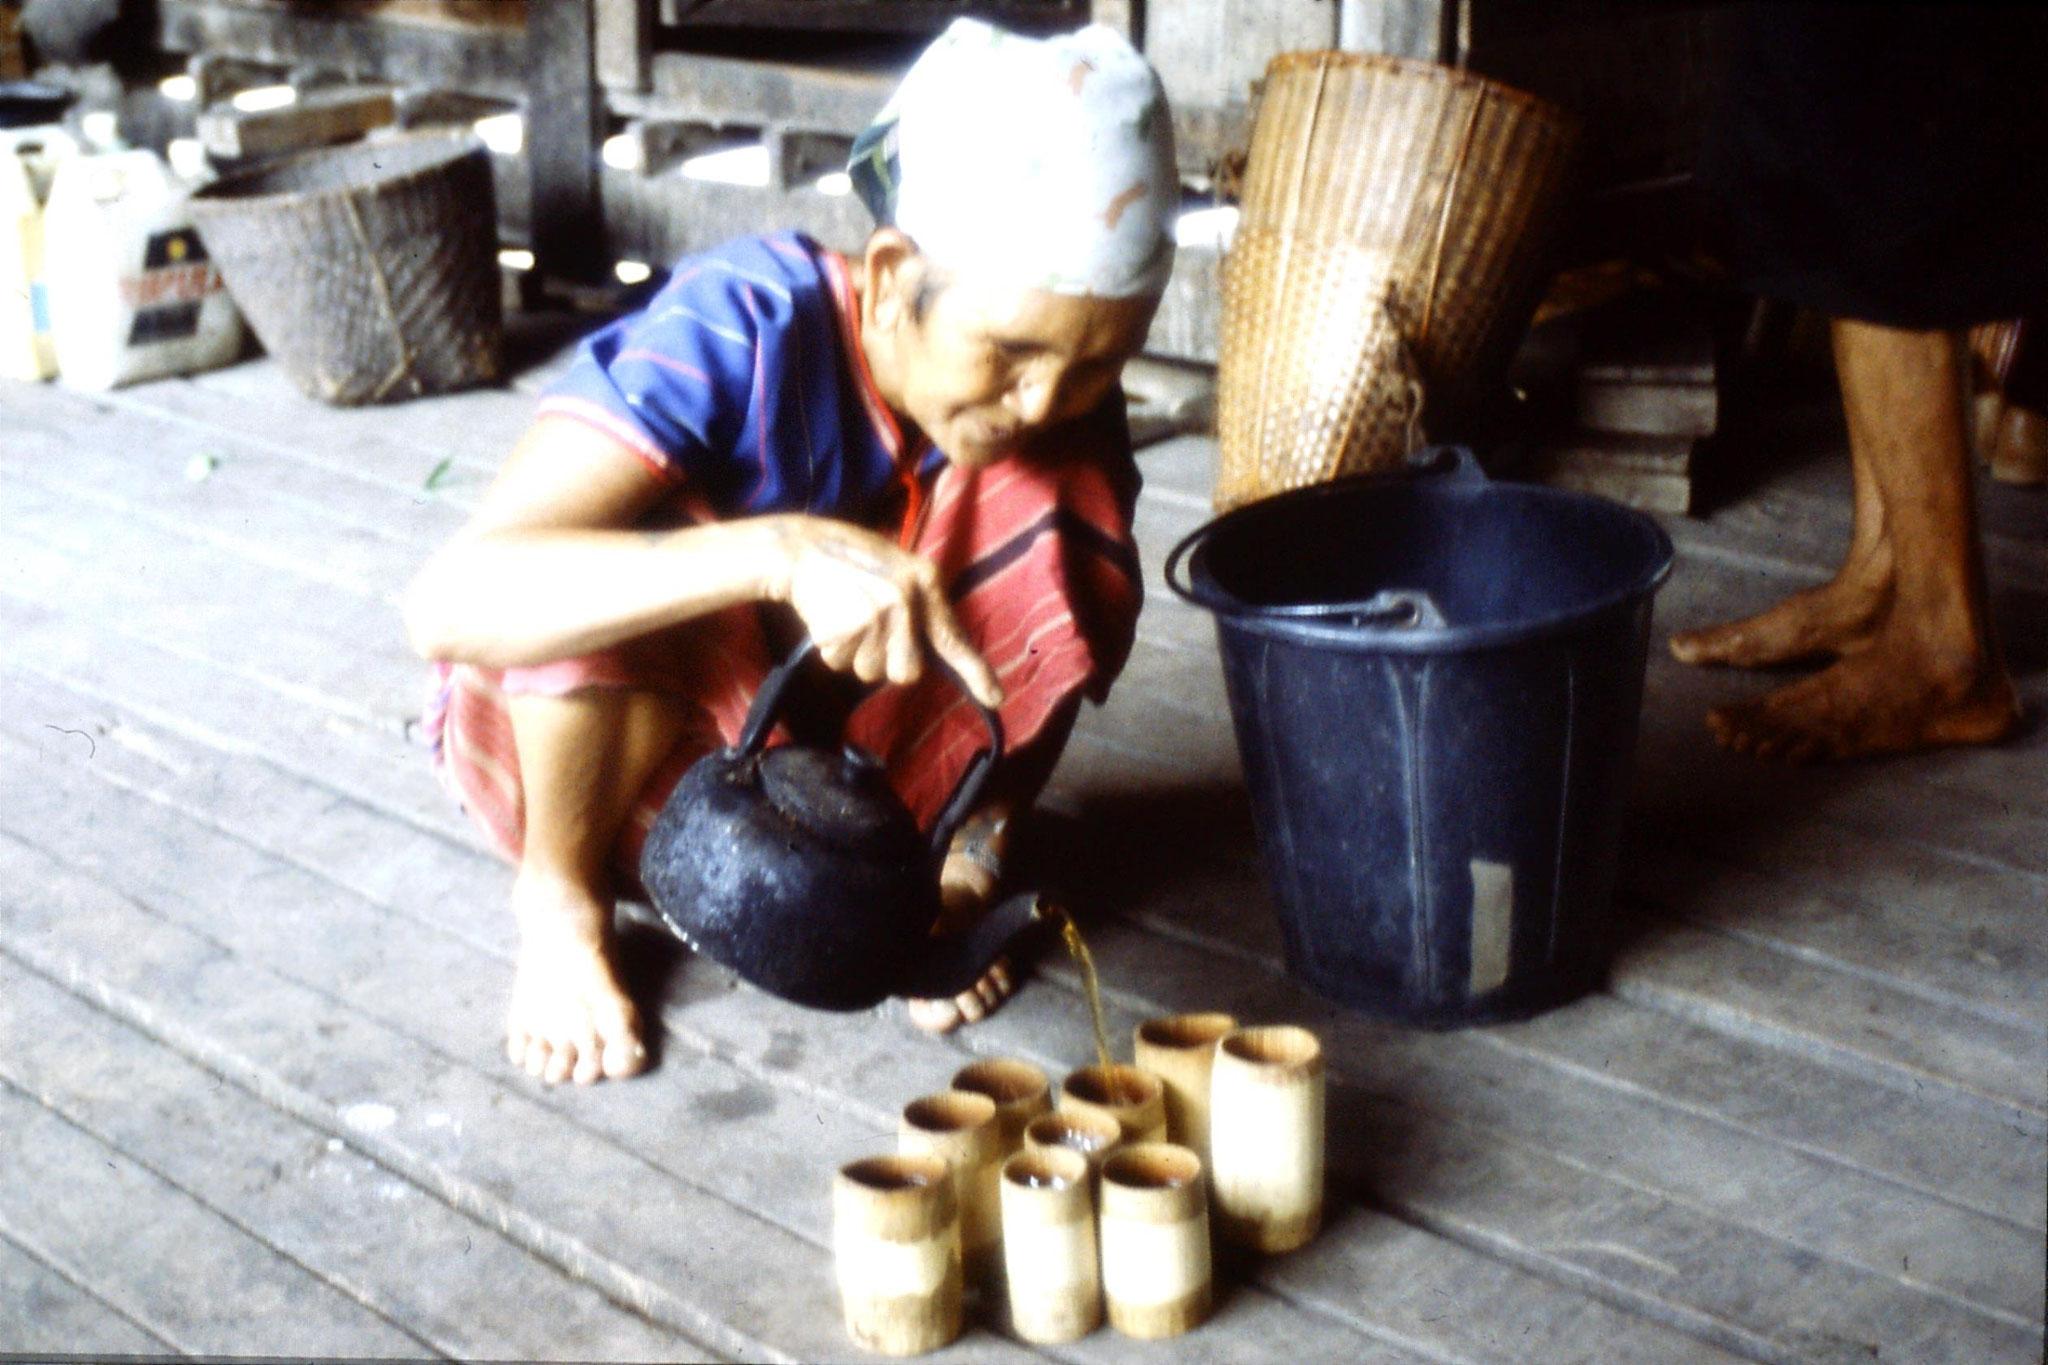 12/6/1990: 23: Trek - Hue Kom Karen village, pouring tea